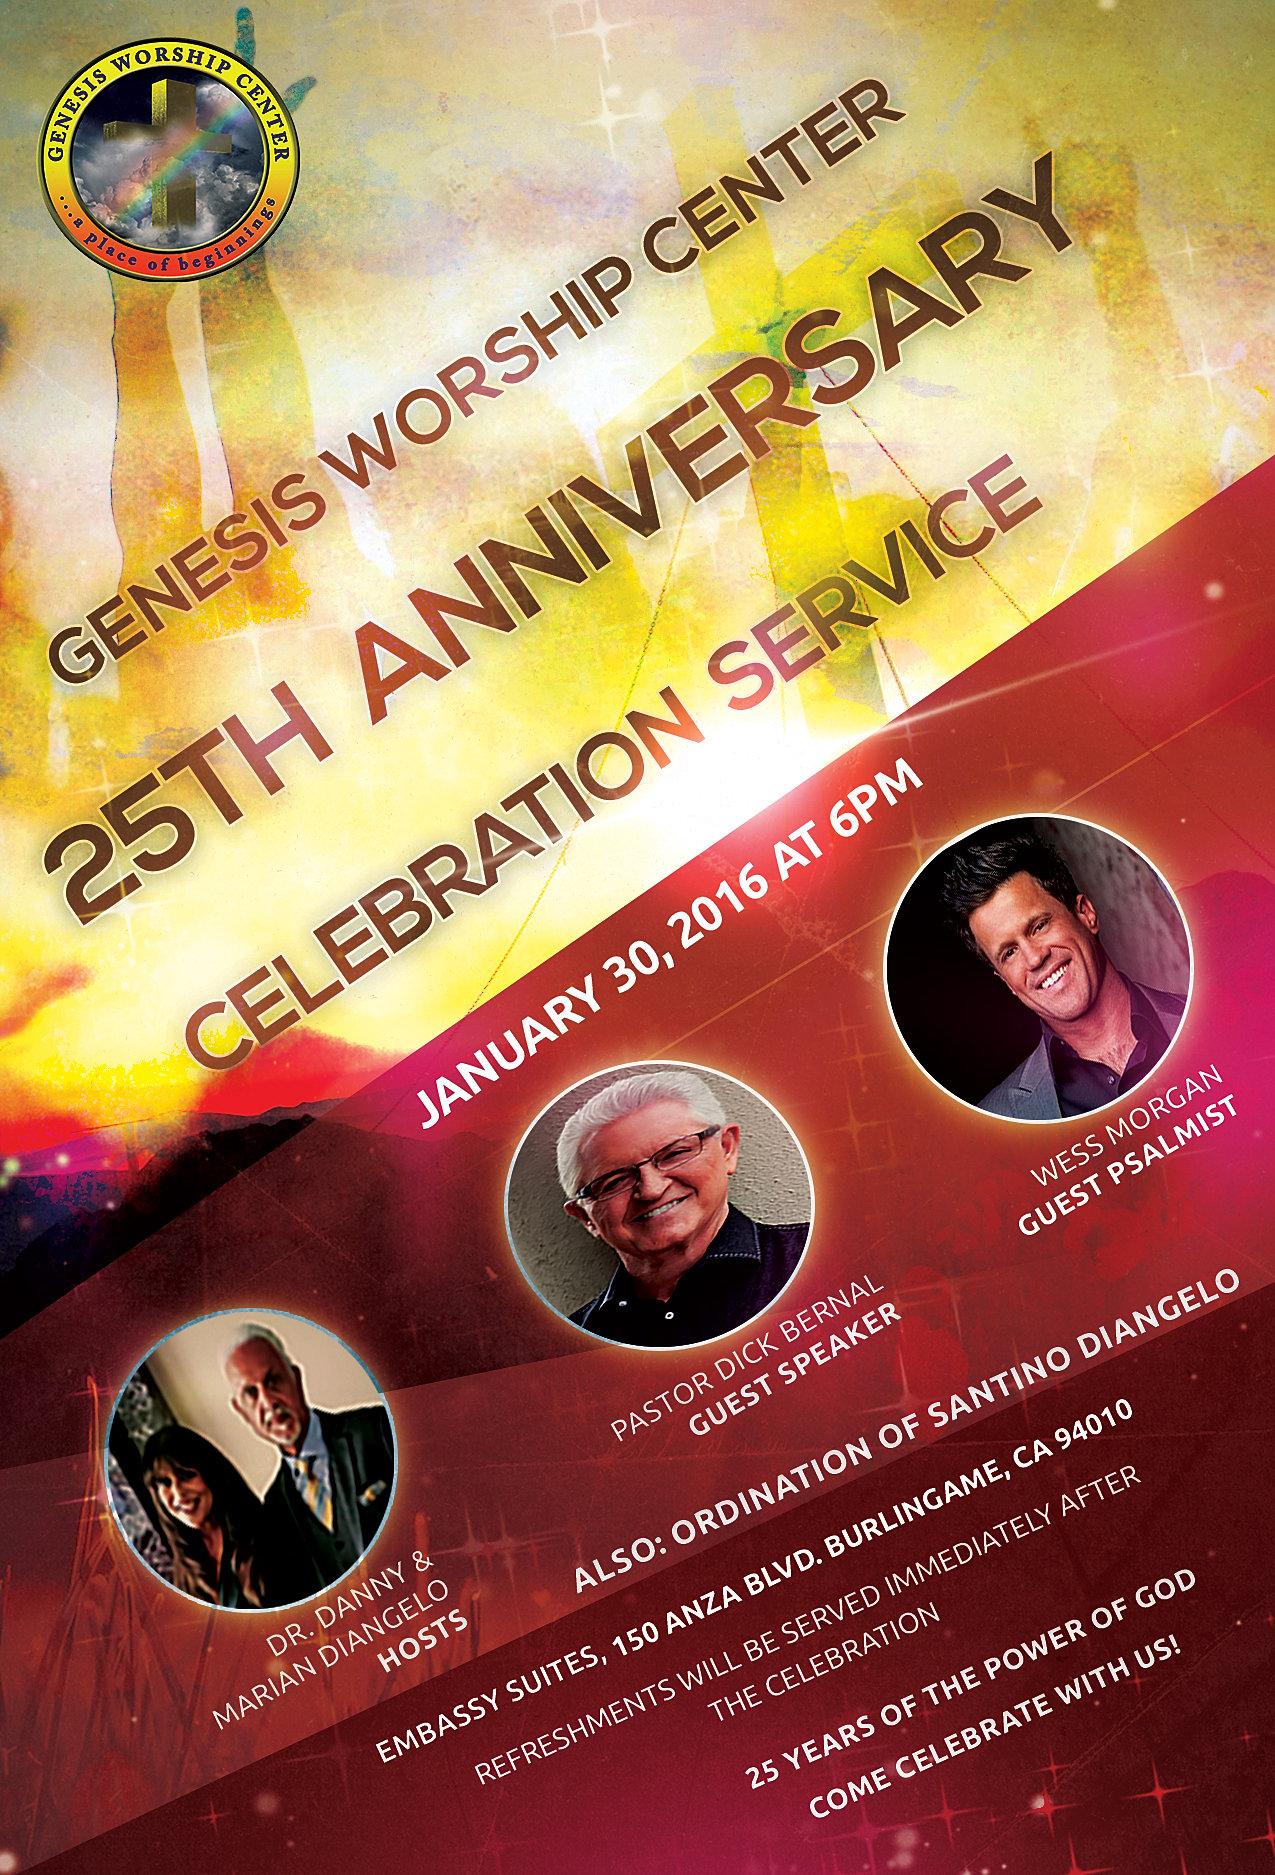 genesis worship center church flyer main 1 jpg genesis worship center church flyer main 1 jpg